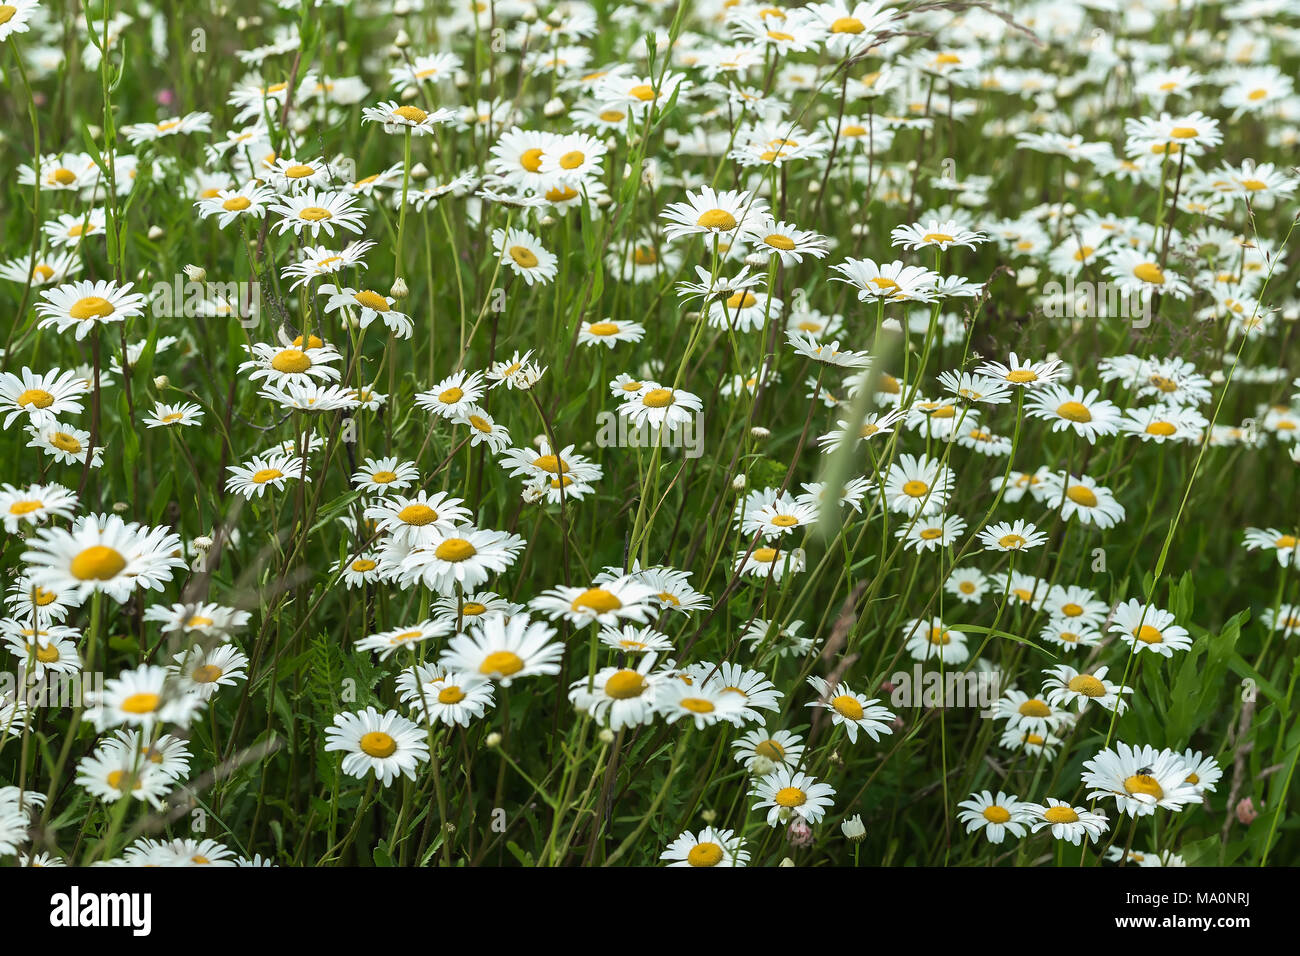 Beautiful white daisies in the wind many wild meadow of daisy beautiful white daisies in the wind many wild meadow of daisy flowers summer day after rain seasons ecology green planet healthy natural green izmirmasajfo